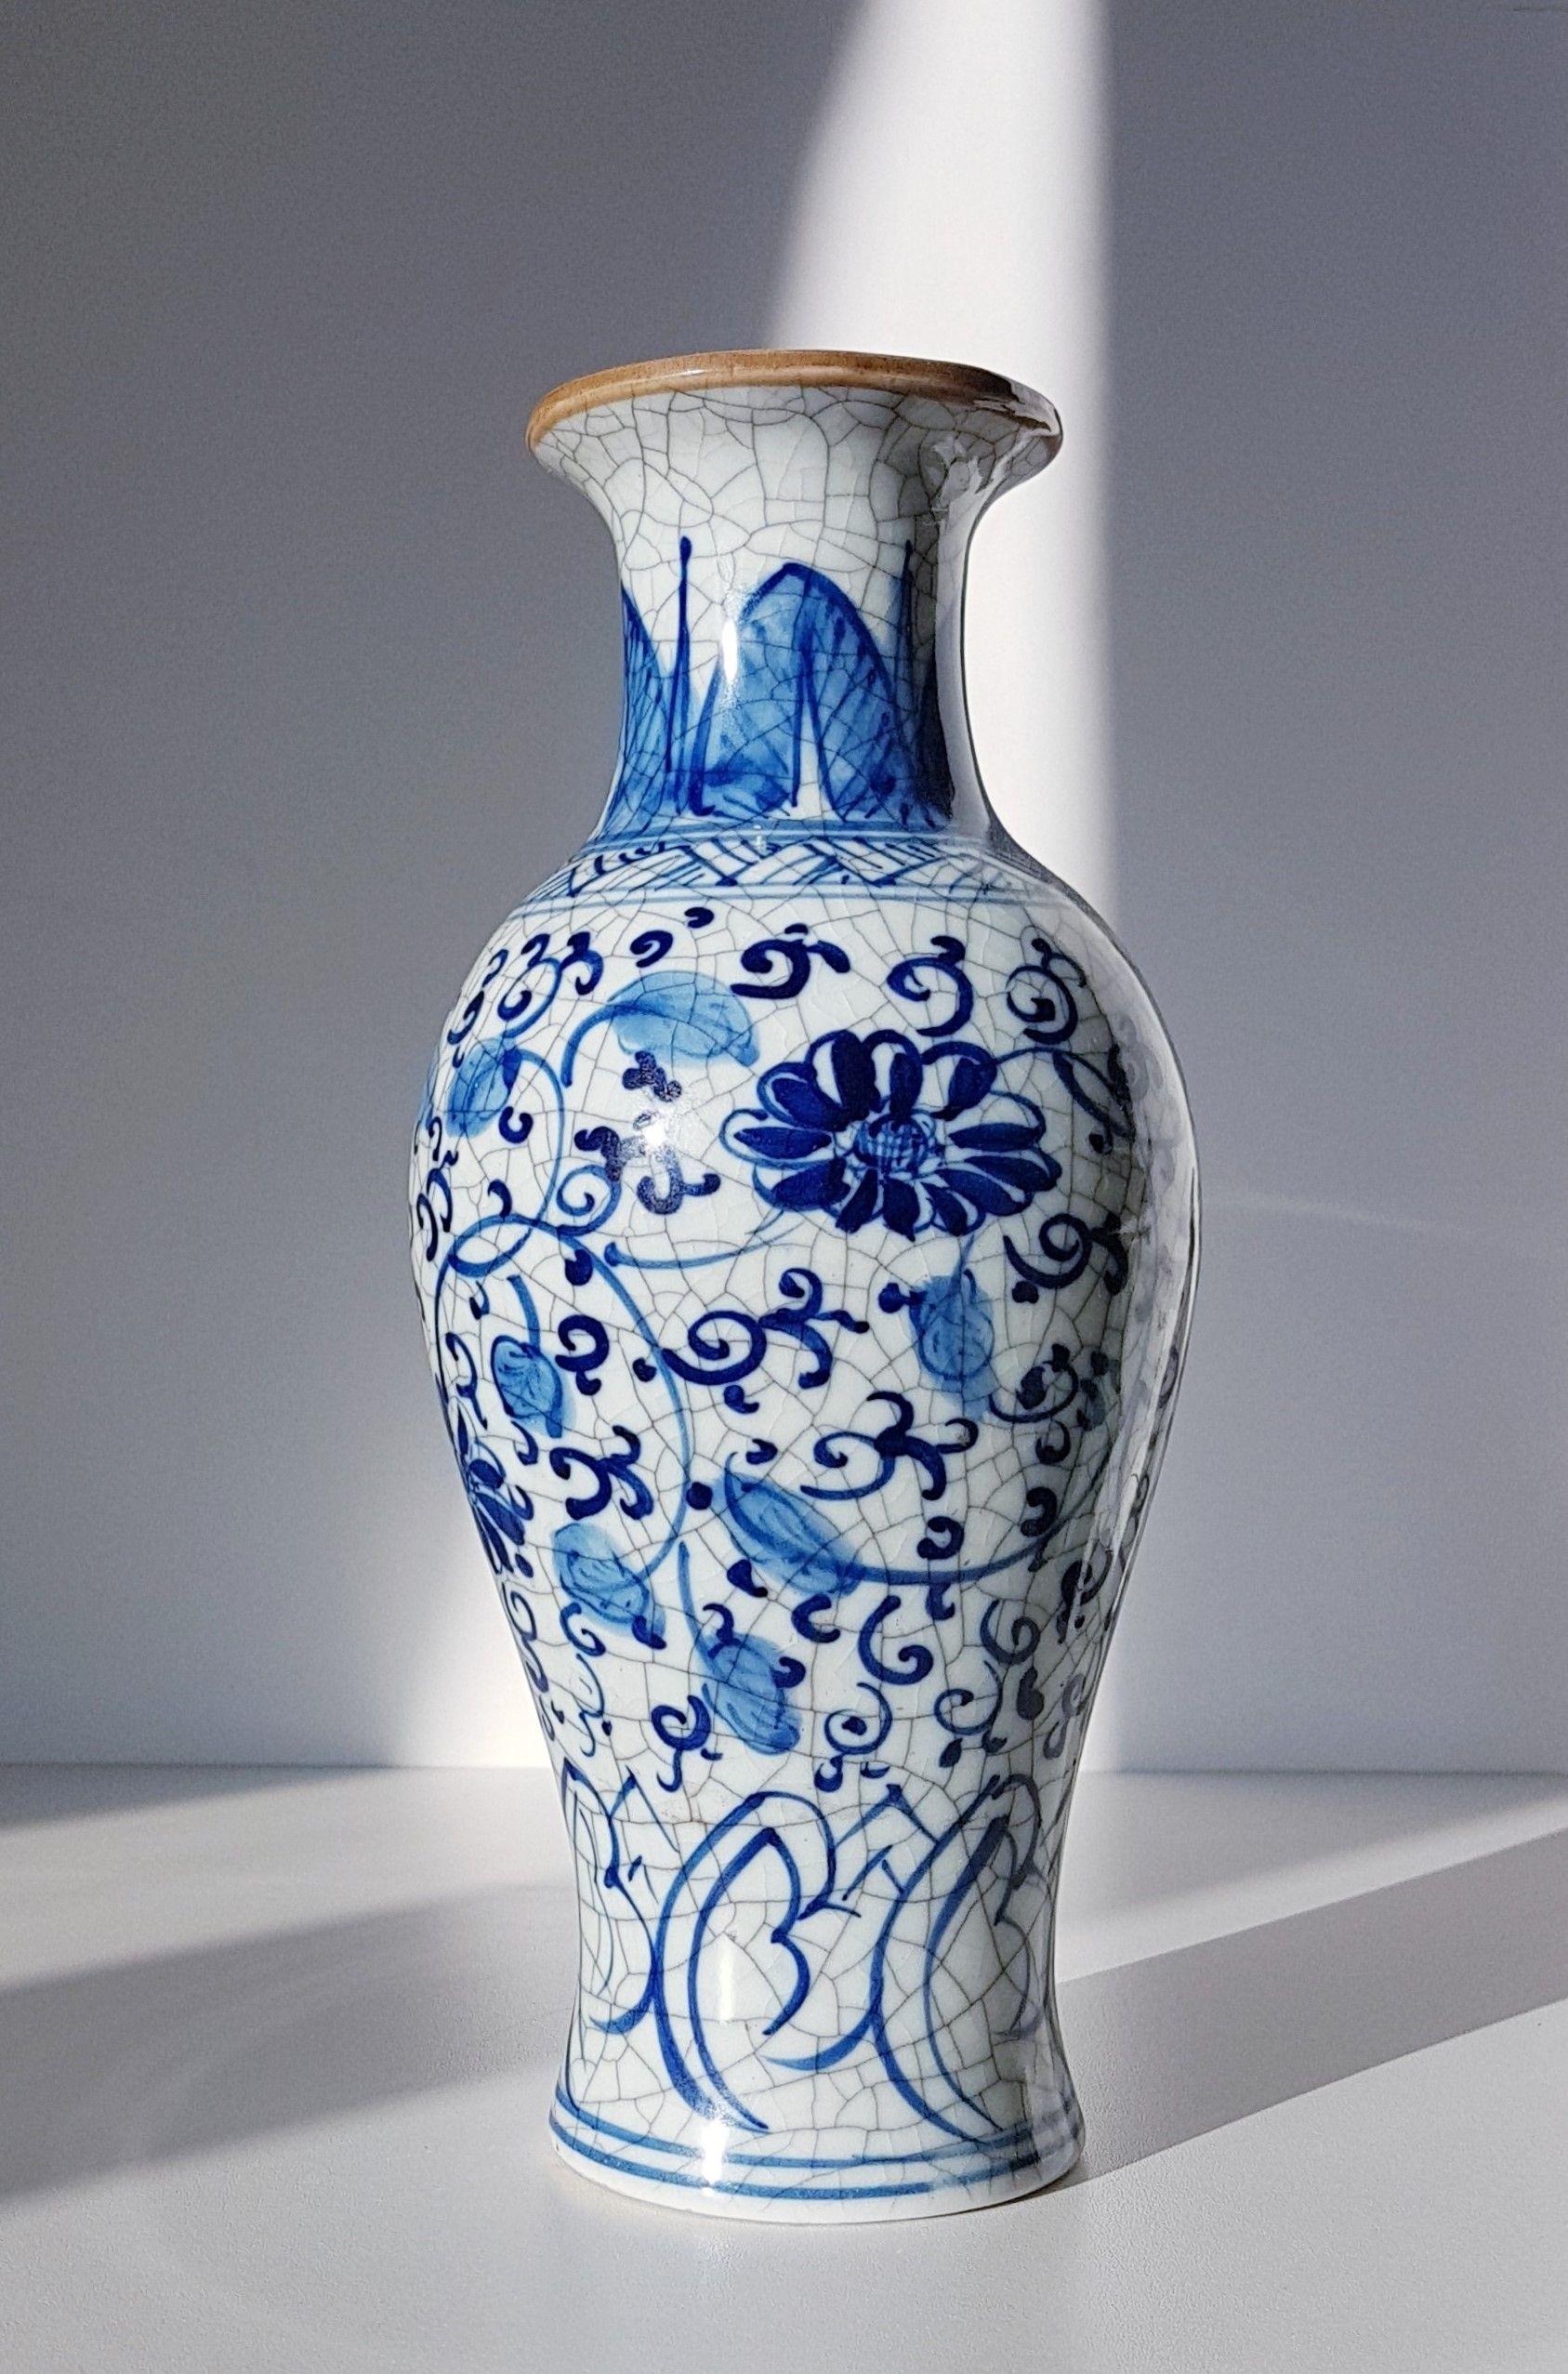 1960s Japanese Multiglass Ftg Clear Blue And Green Art Glass Baluster And Scroll Work Vase Glass Art Green Art Blue Floral Decor